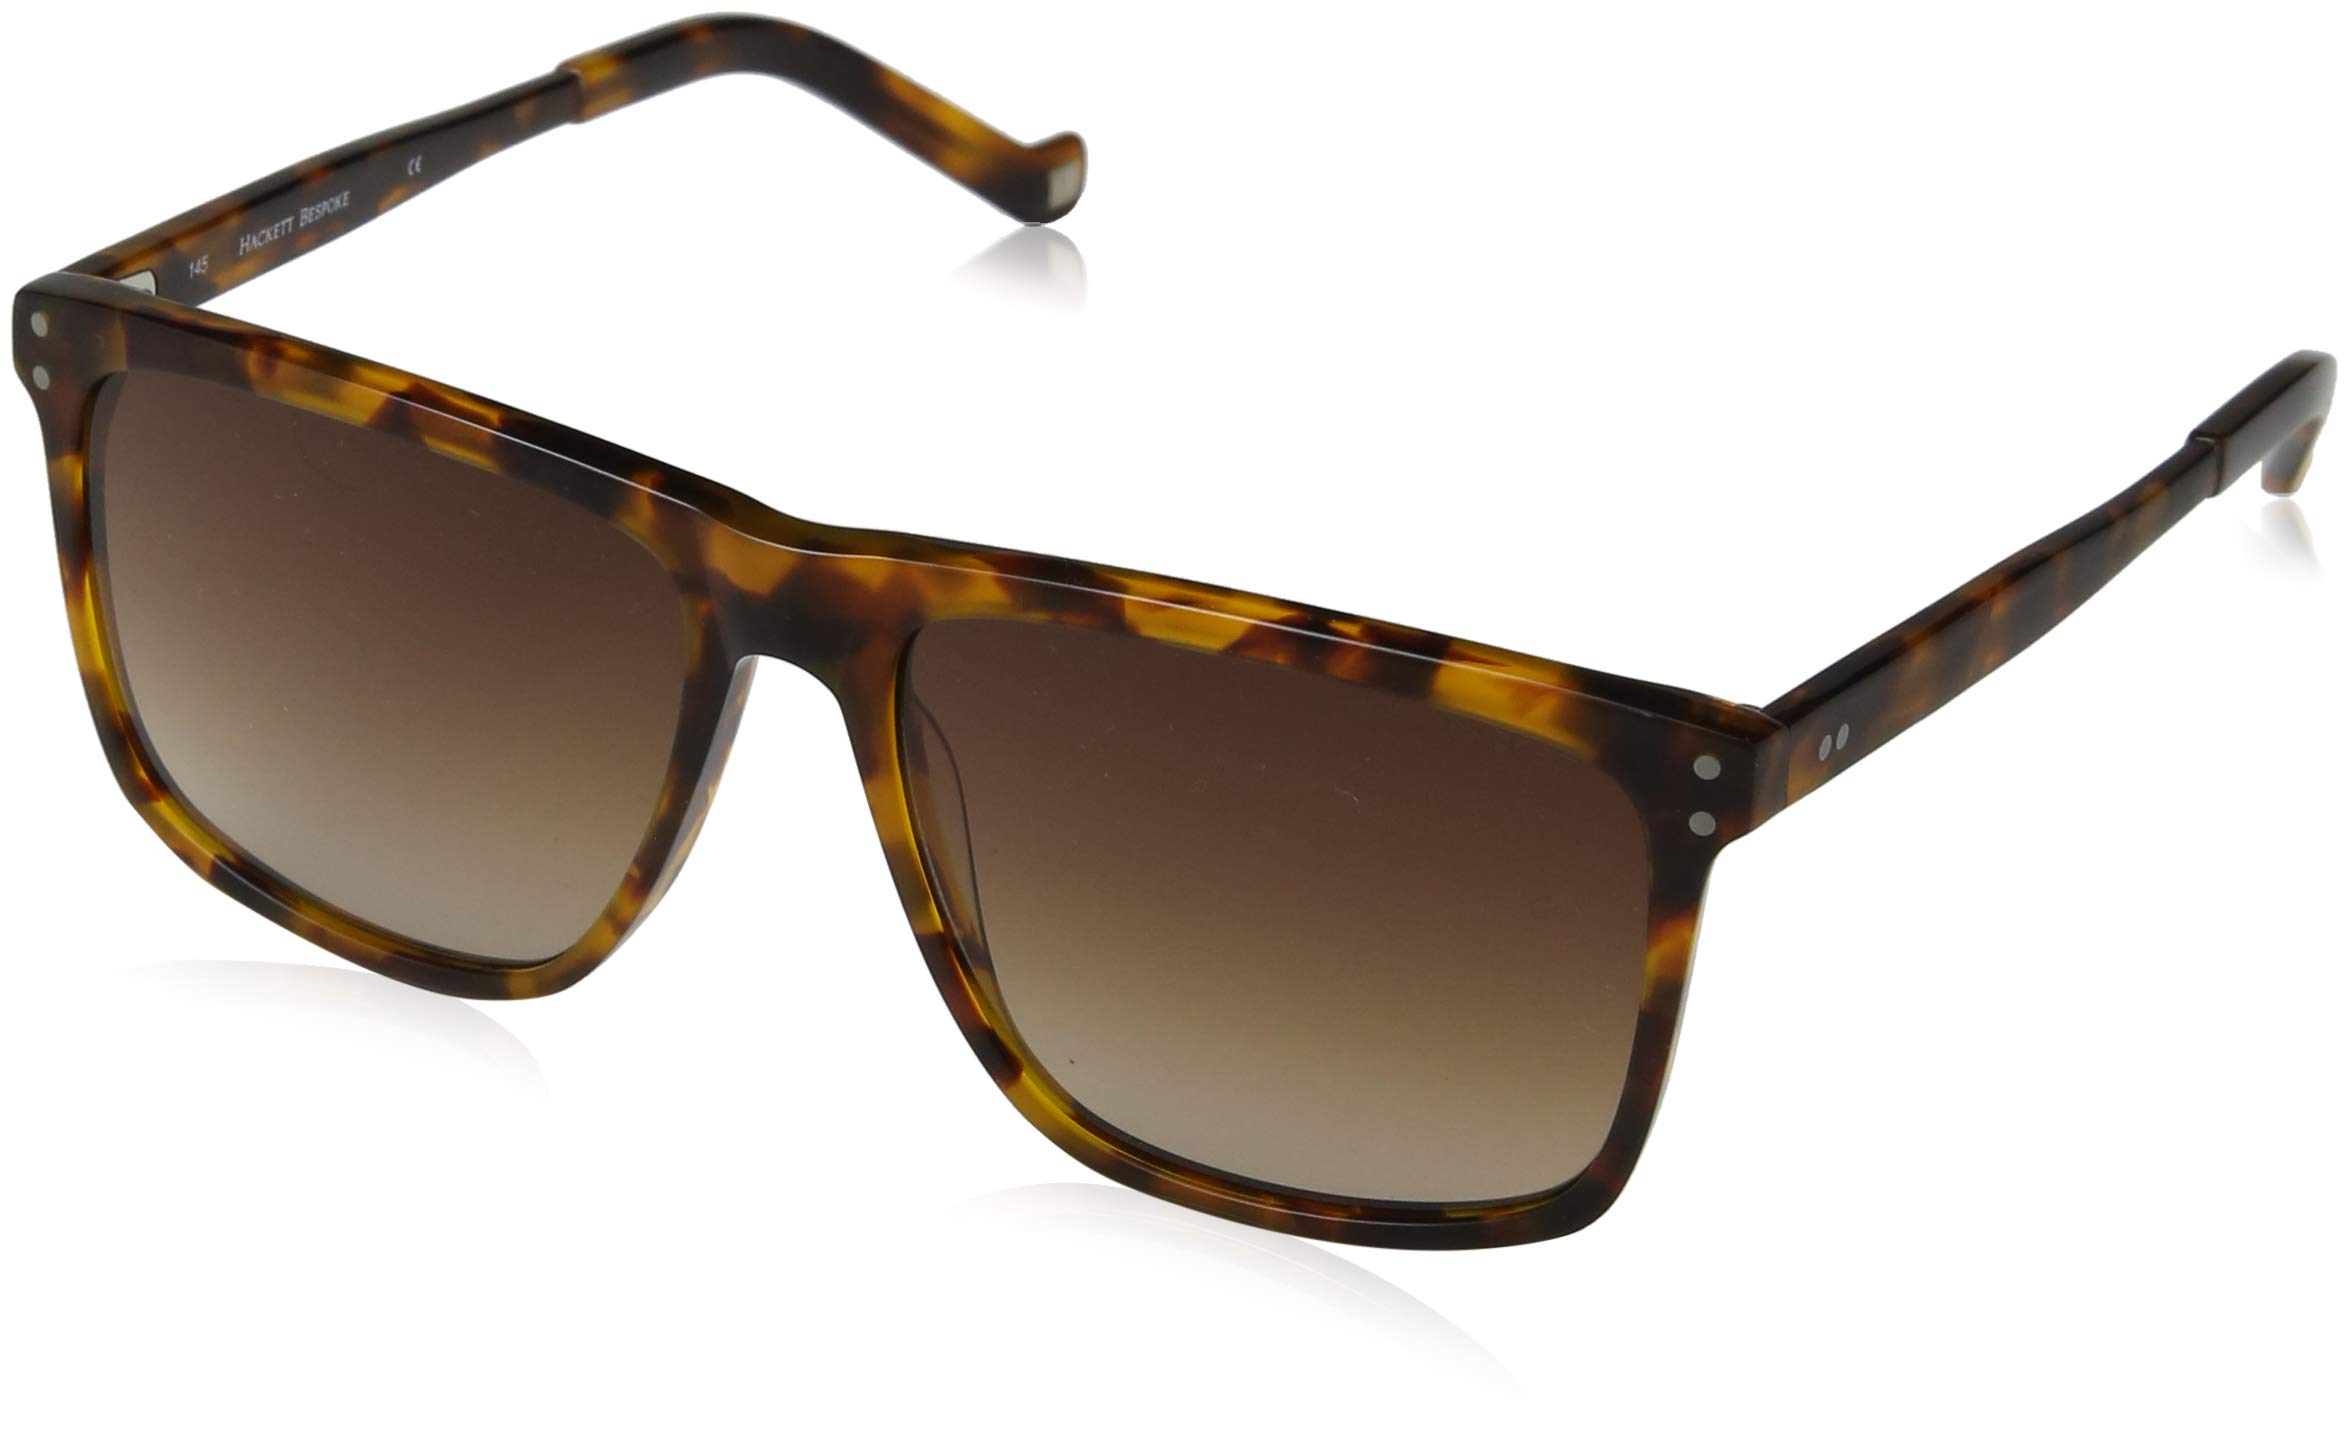 Bespoke Sunglasses 0 Hackett De Homme brown57 Montures LunettesMarrontort XuPZiOk